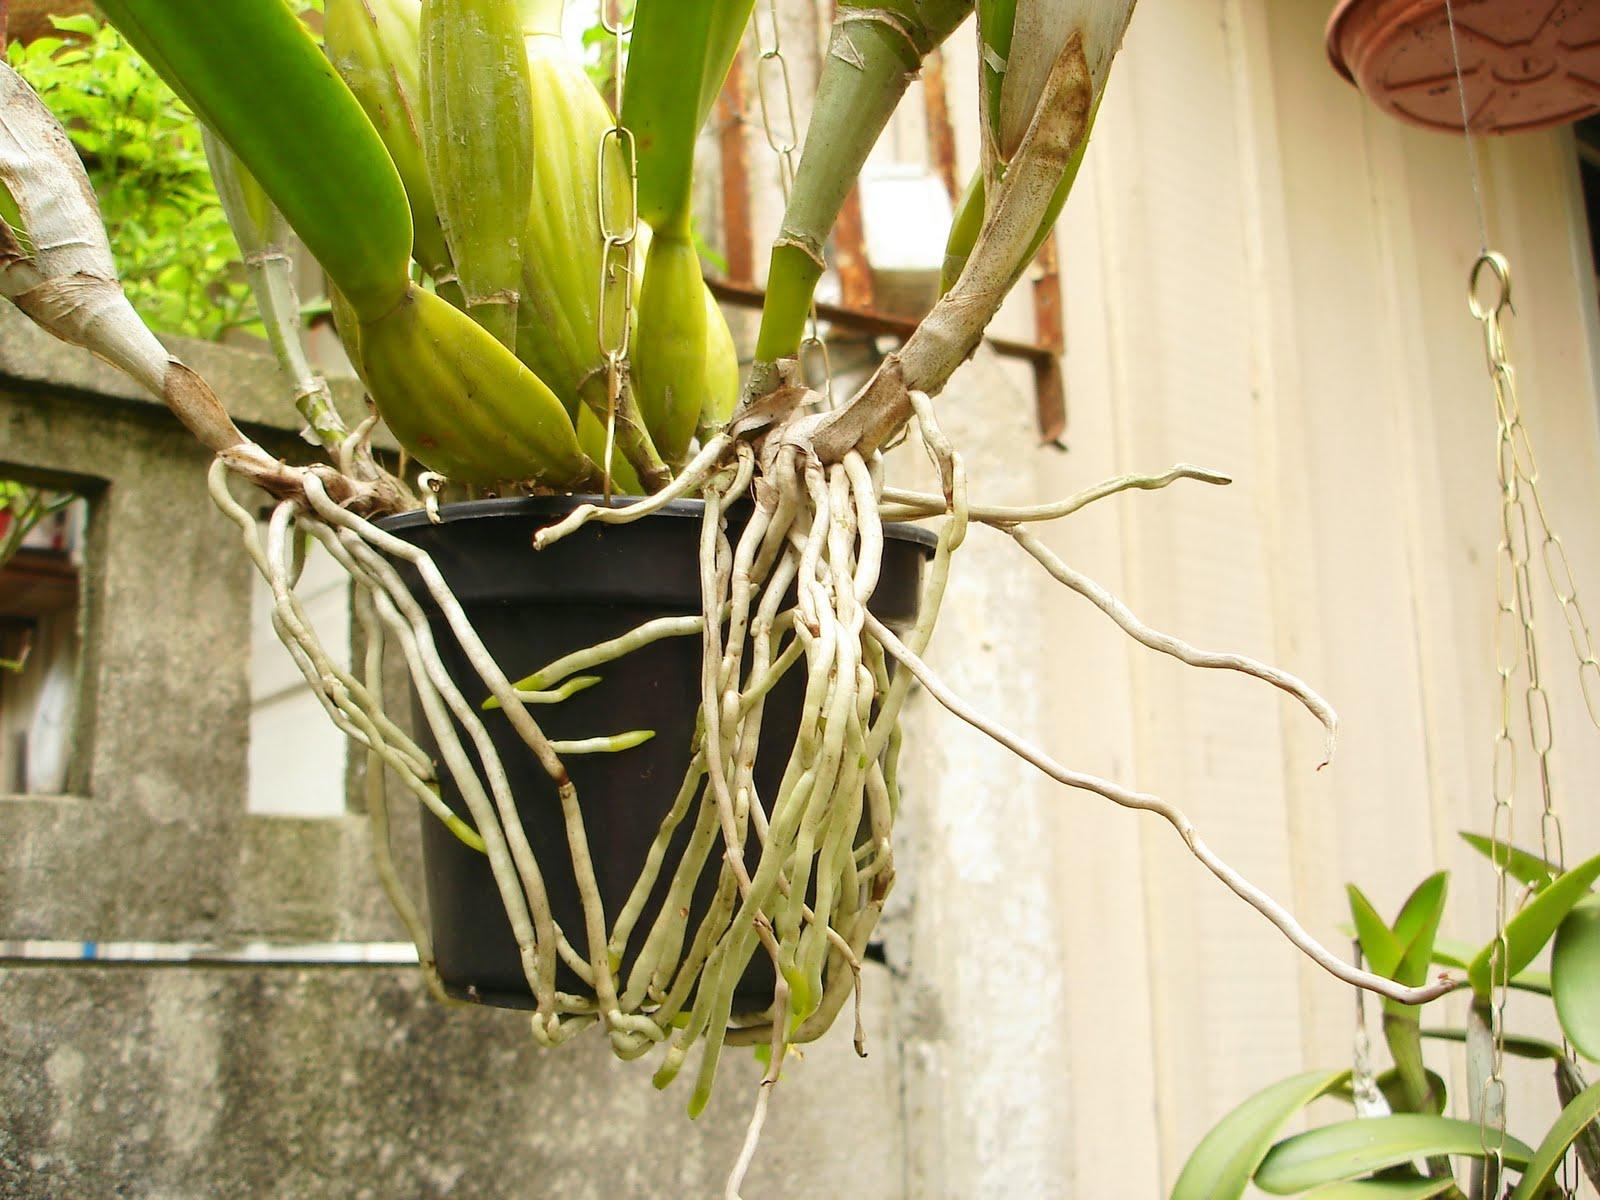 orquidea-com-raizes